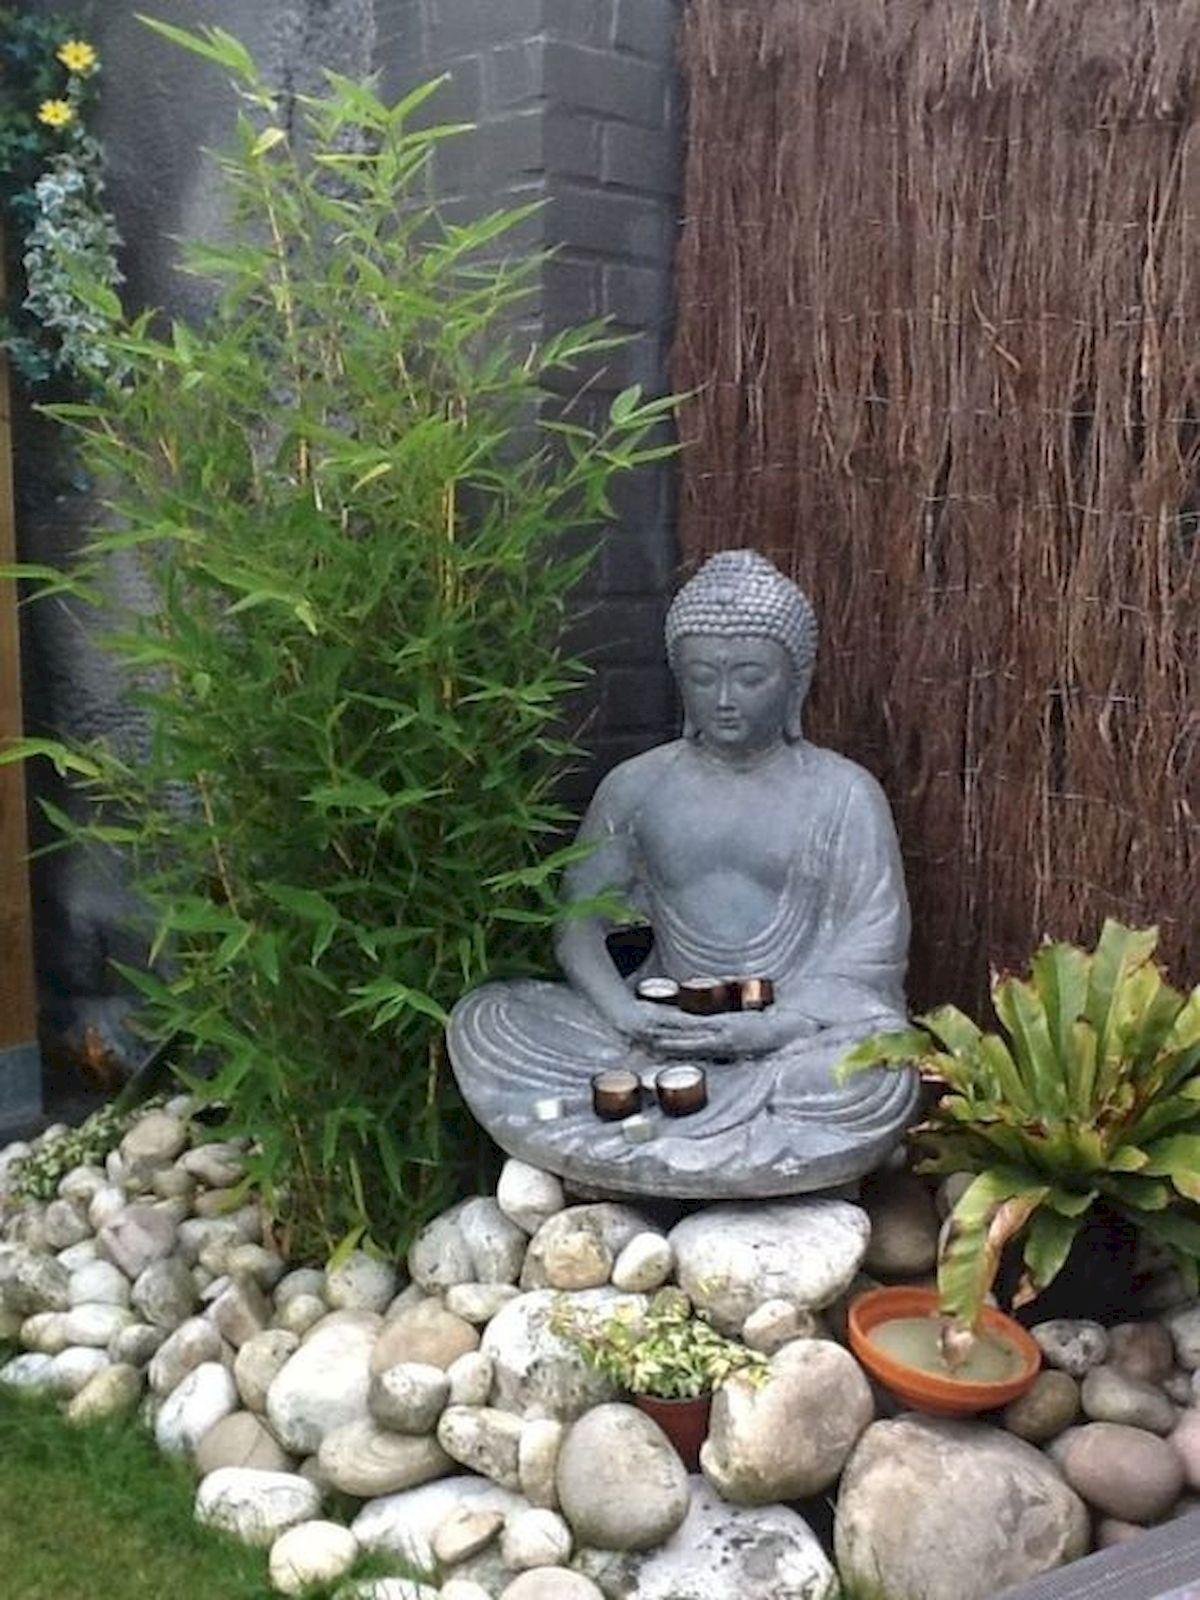 Hottest Photo Zen Garden Ideas Popular You Can Find Modern Gardens Contemporary Gardens Zen Gardens Stone Gardens In 2021 Mini Zen Garden Zen Garden Buddha Garden